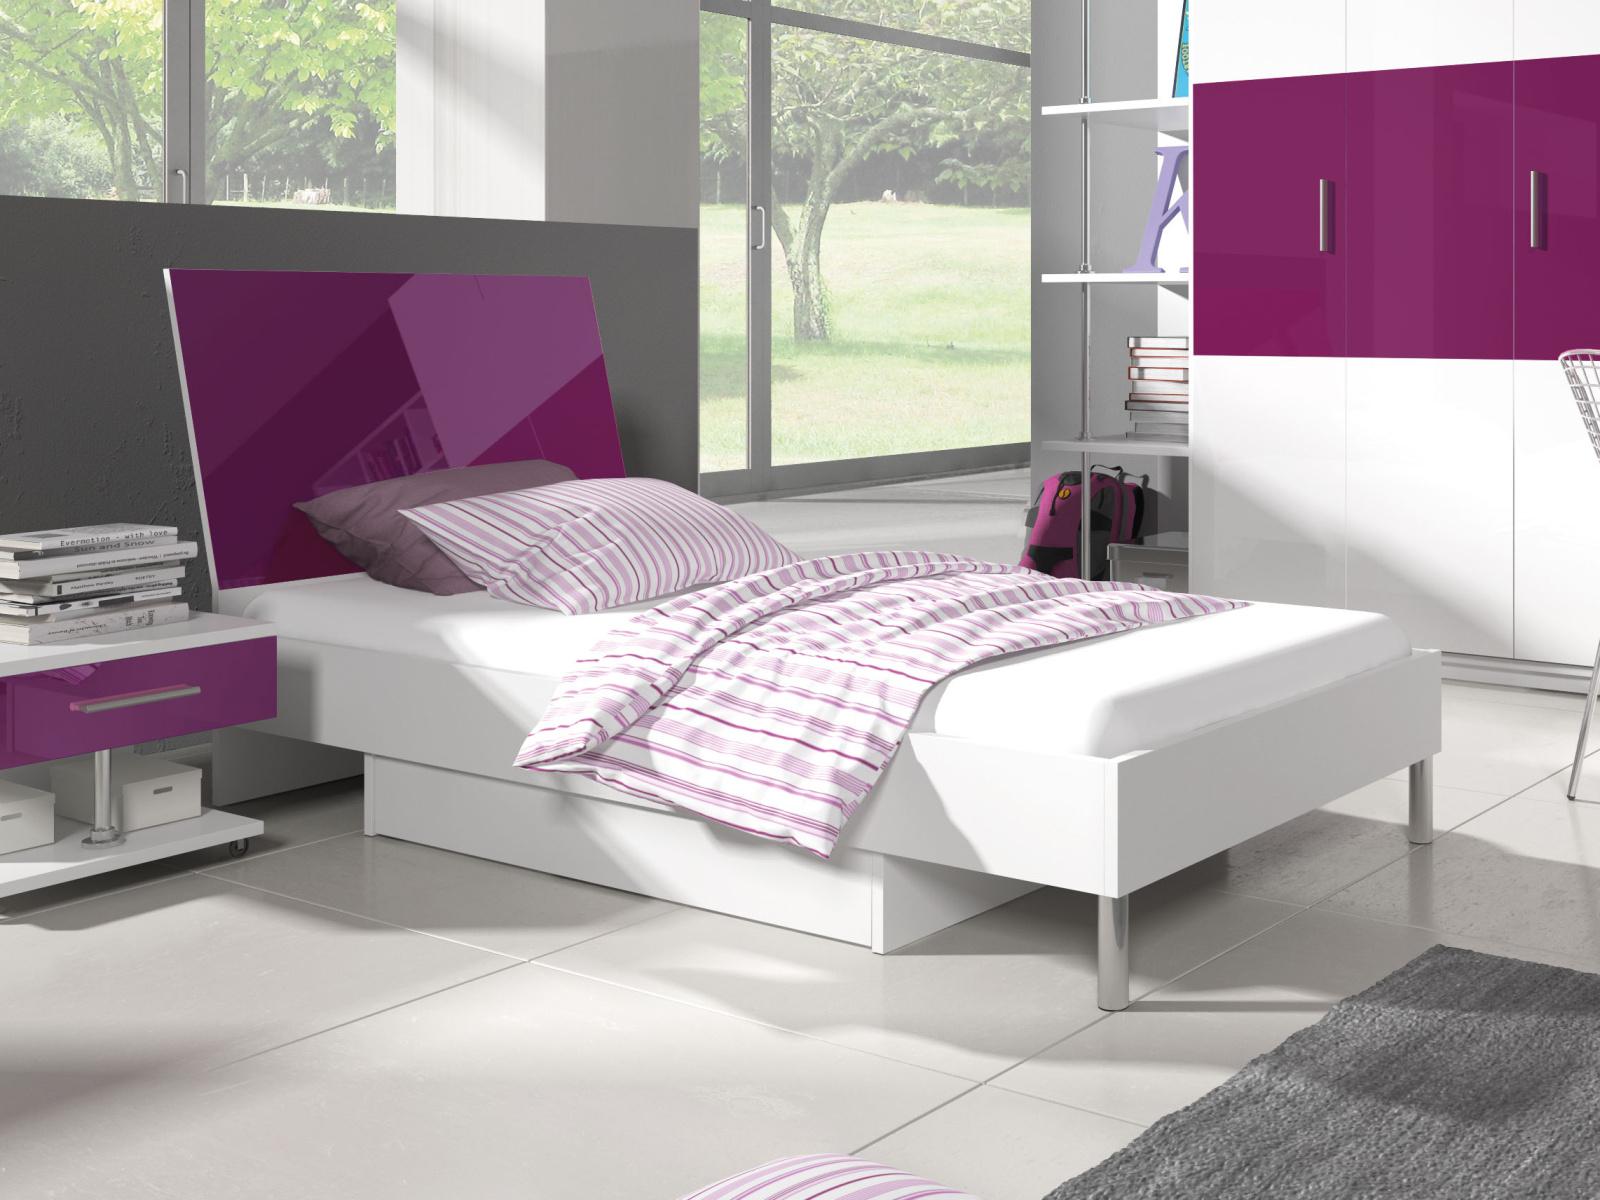 Smartshop Postel 90x200 cm RAJ 3, bílá/fialový lesk